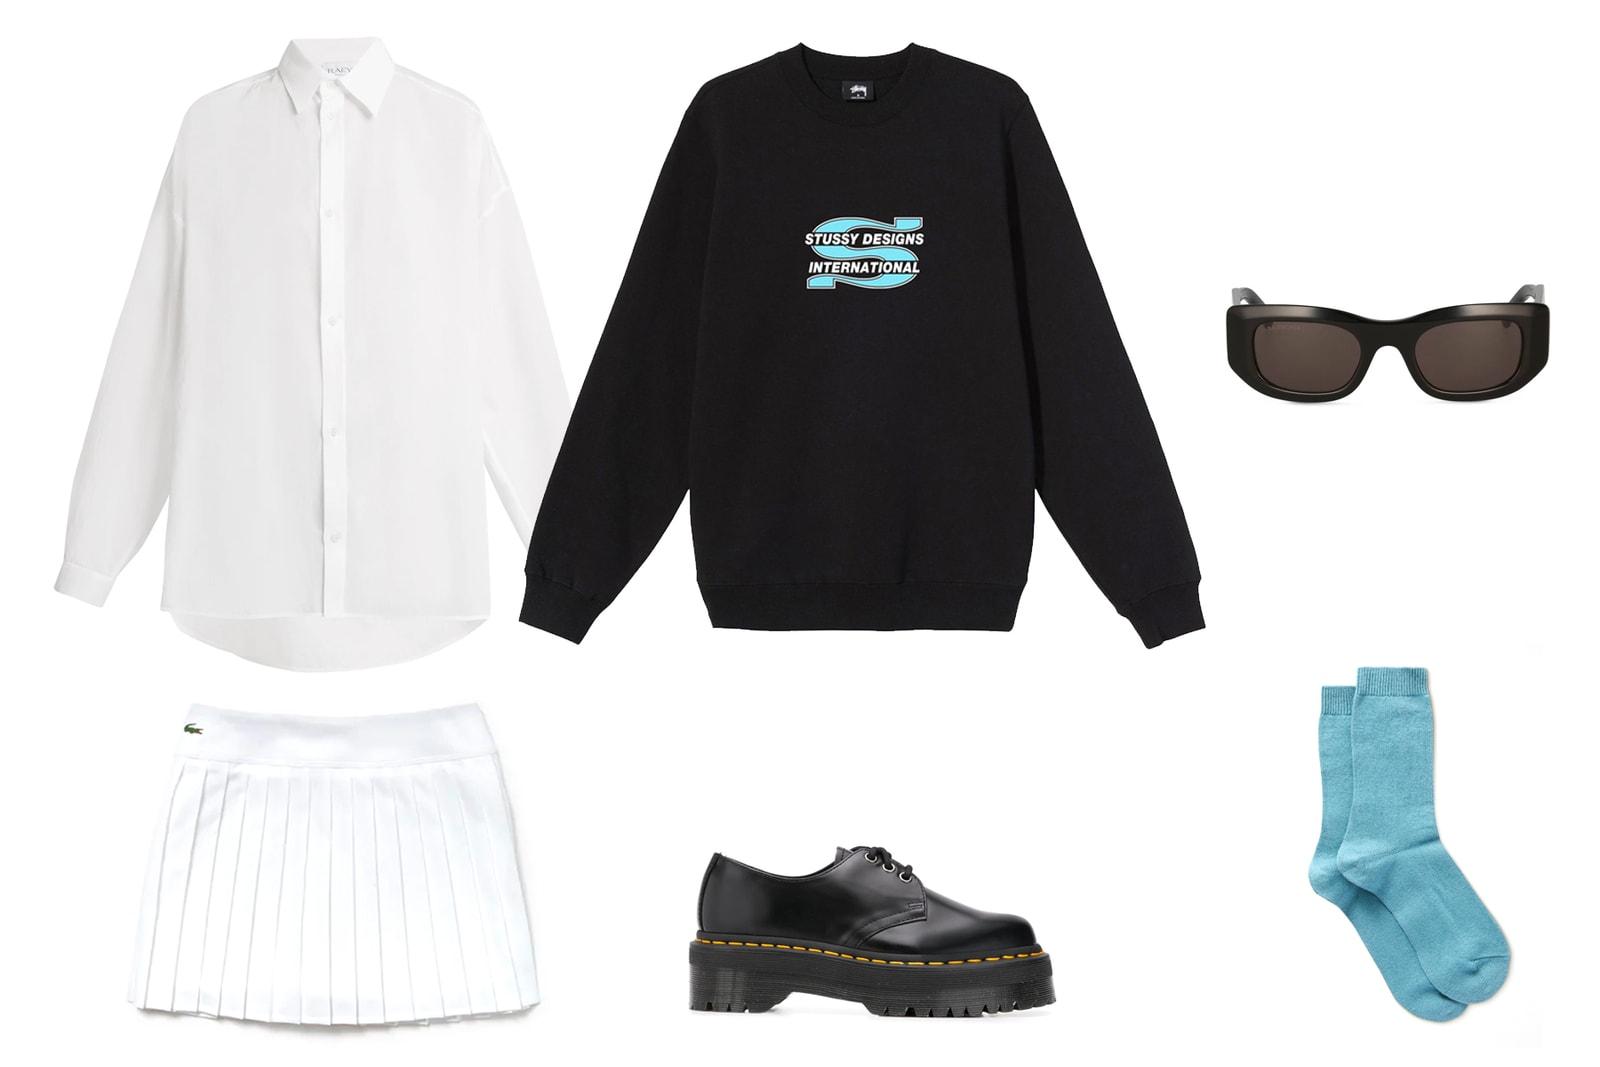 Crewneck Sweatshirt Sweater Outfit Nike Logo Swoosh Vintage Blue Jeans Prada Black Nylon Bag